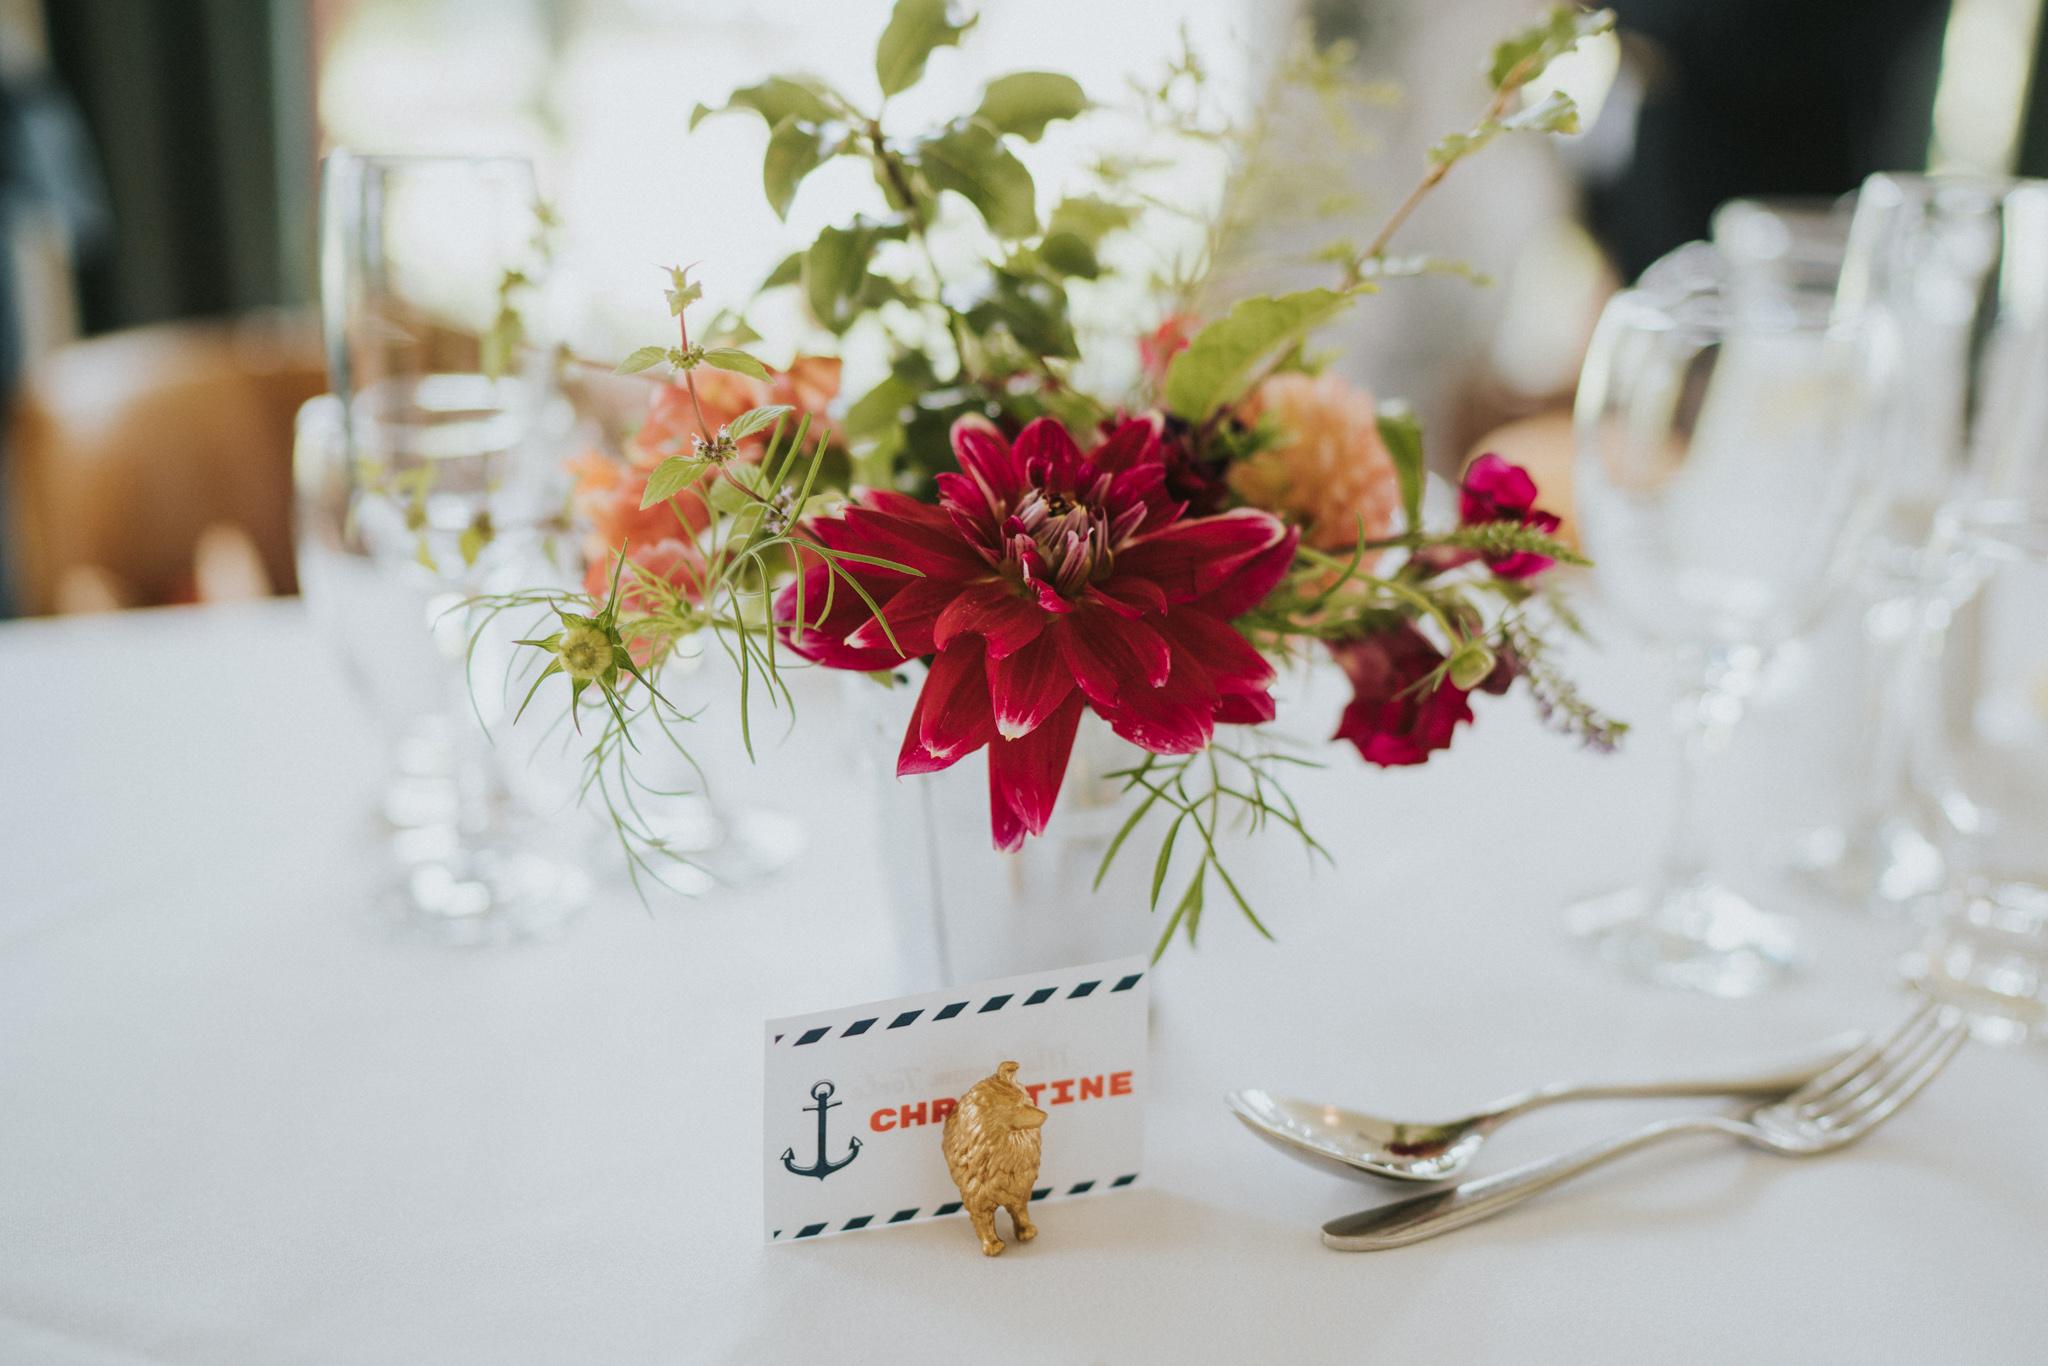 hannah-anthony-thorpeness-retro-diy-50s-wedding-grace-elizabeth-colchester-essex-alternative-wedding-lifestyle-photographer-essex-suffolk-norfolk-devon (27 of 39).jpg